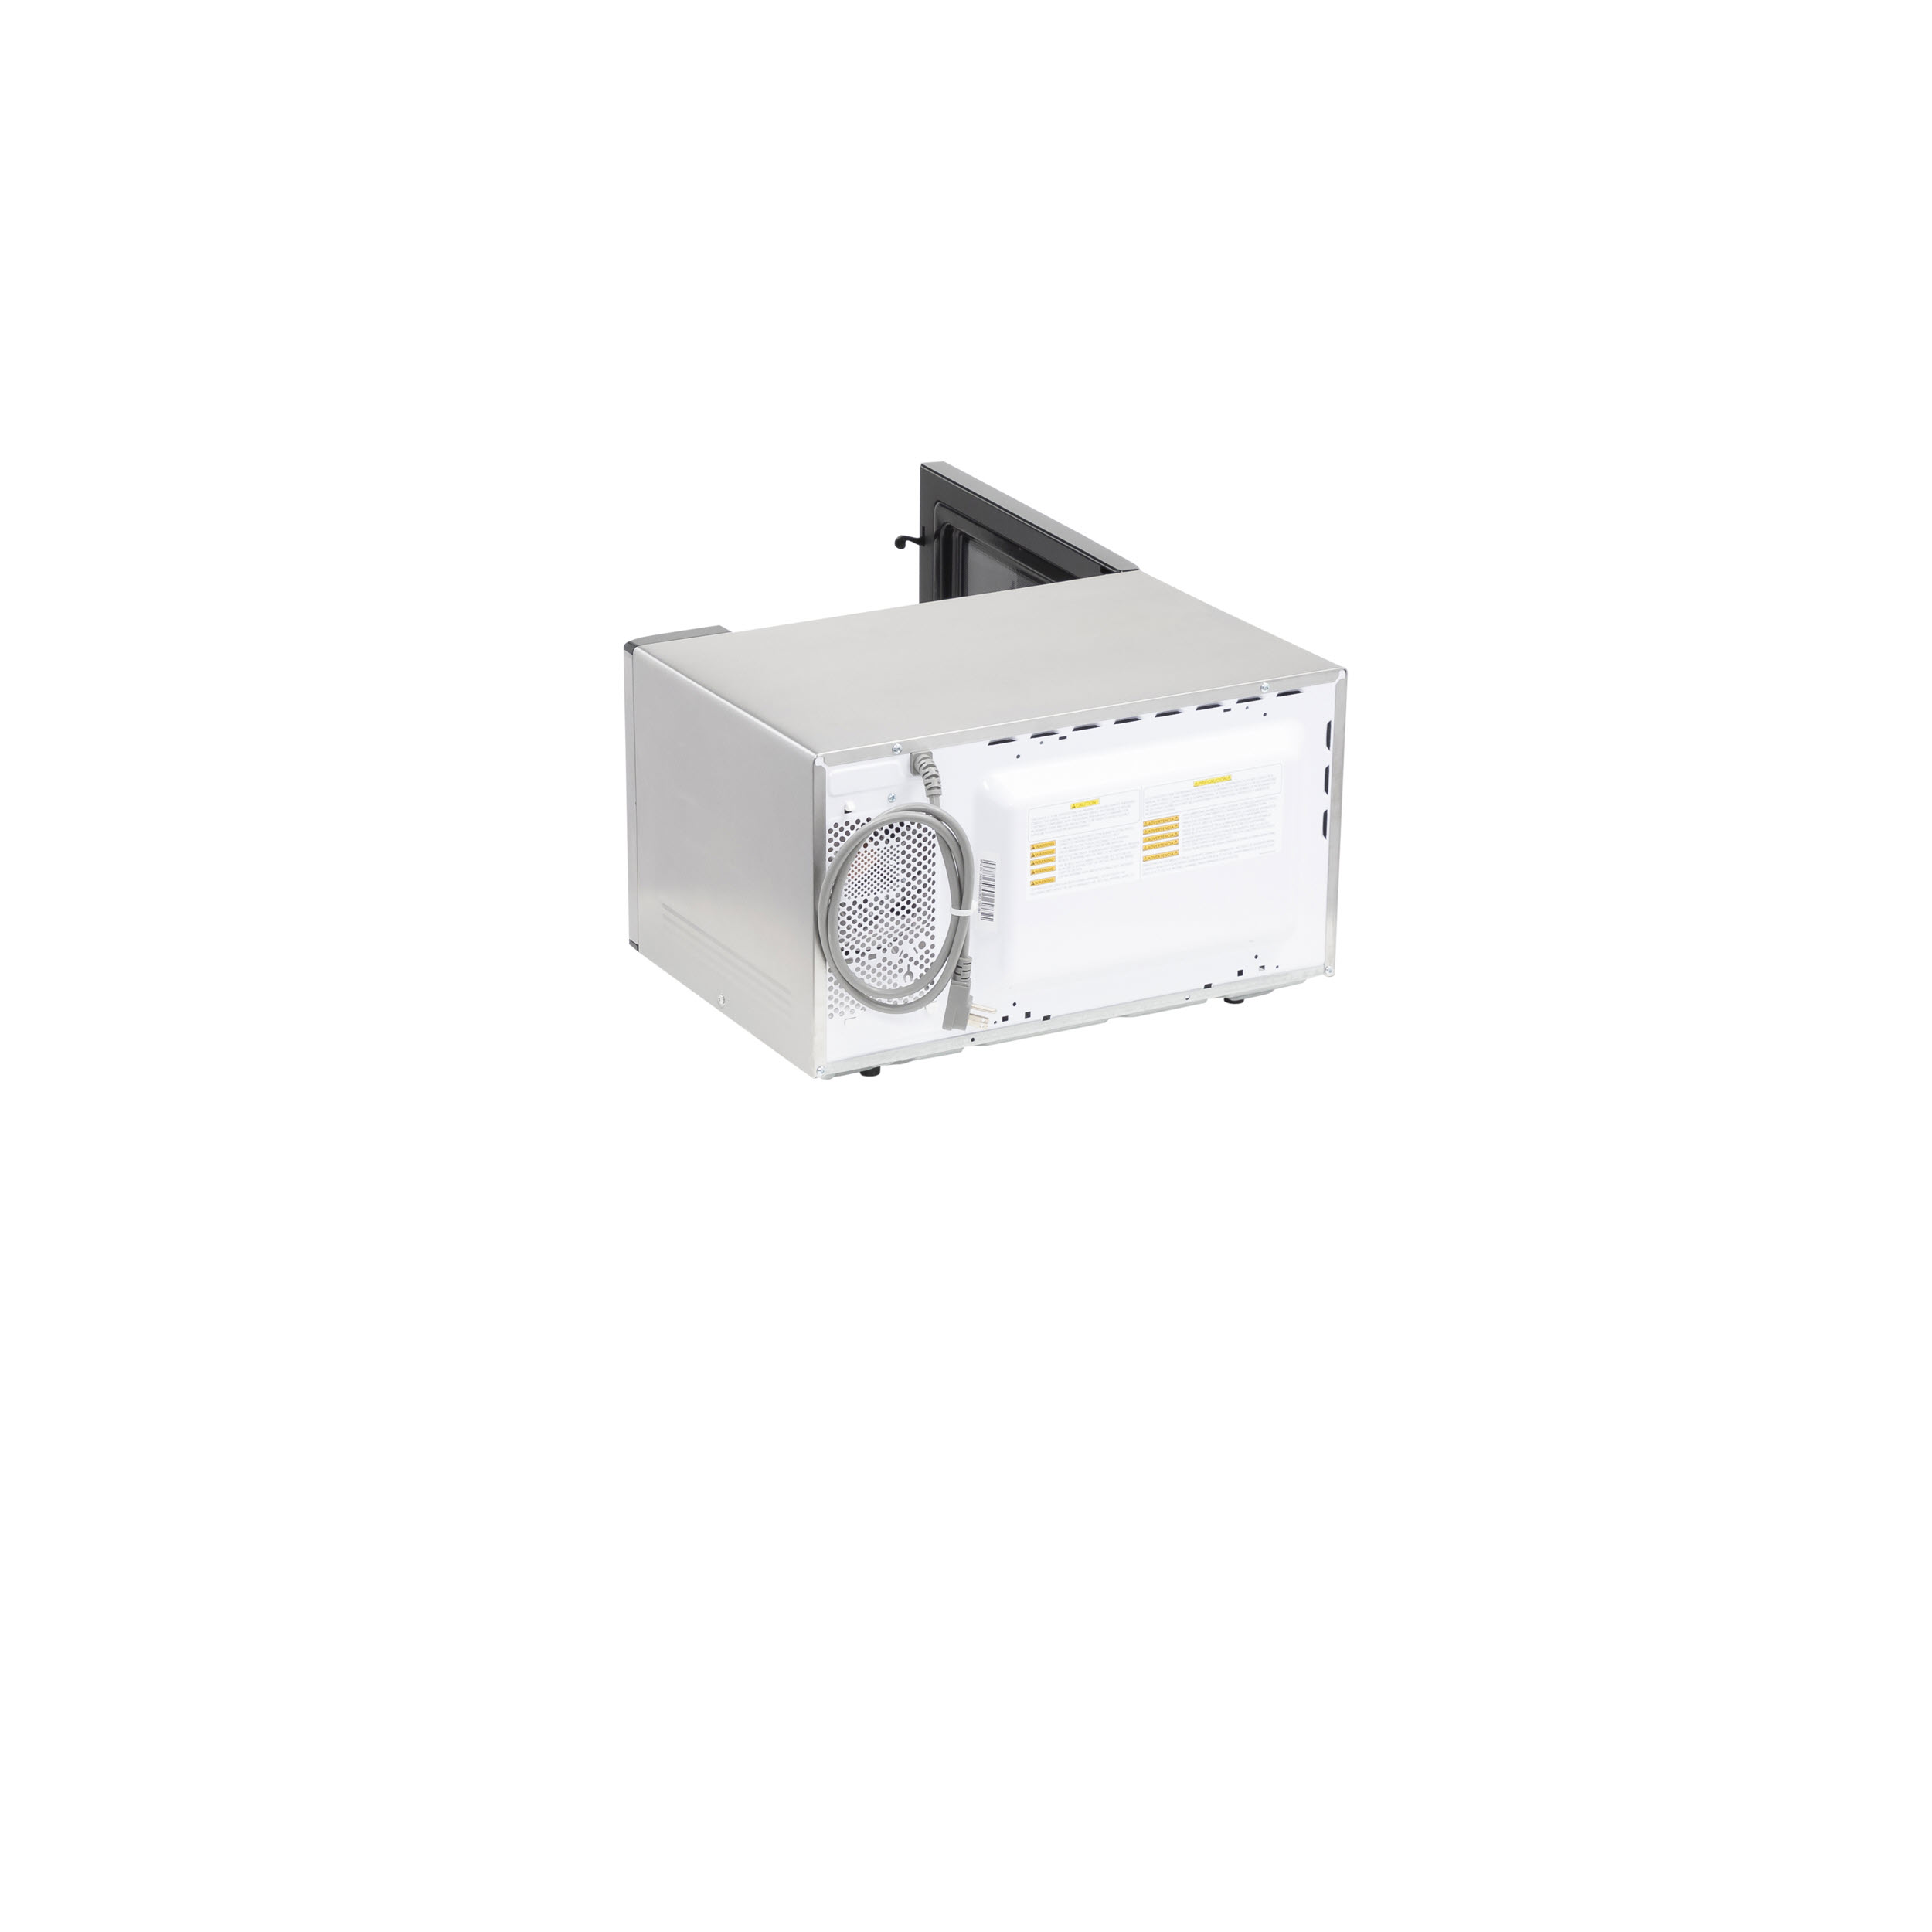 Model: JES1145SHSS | GE GE® 1.1 Cu. Ft. Capacity Countertop Microwave Oven